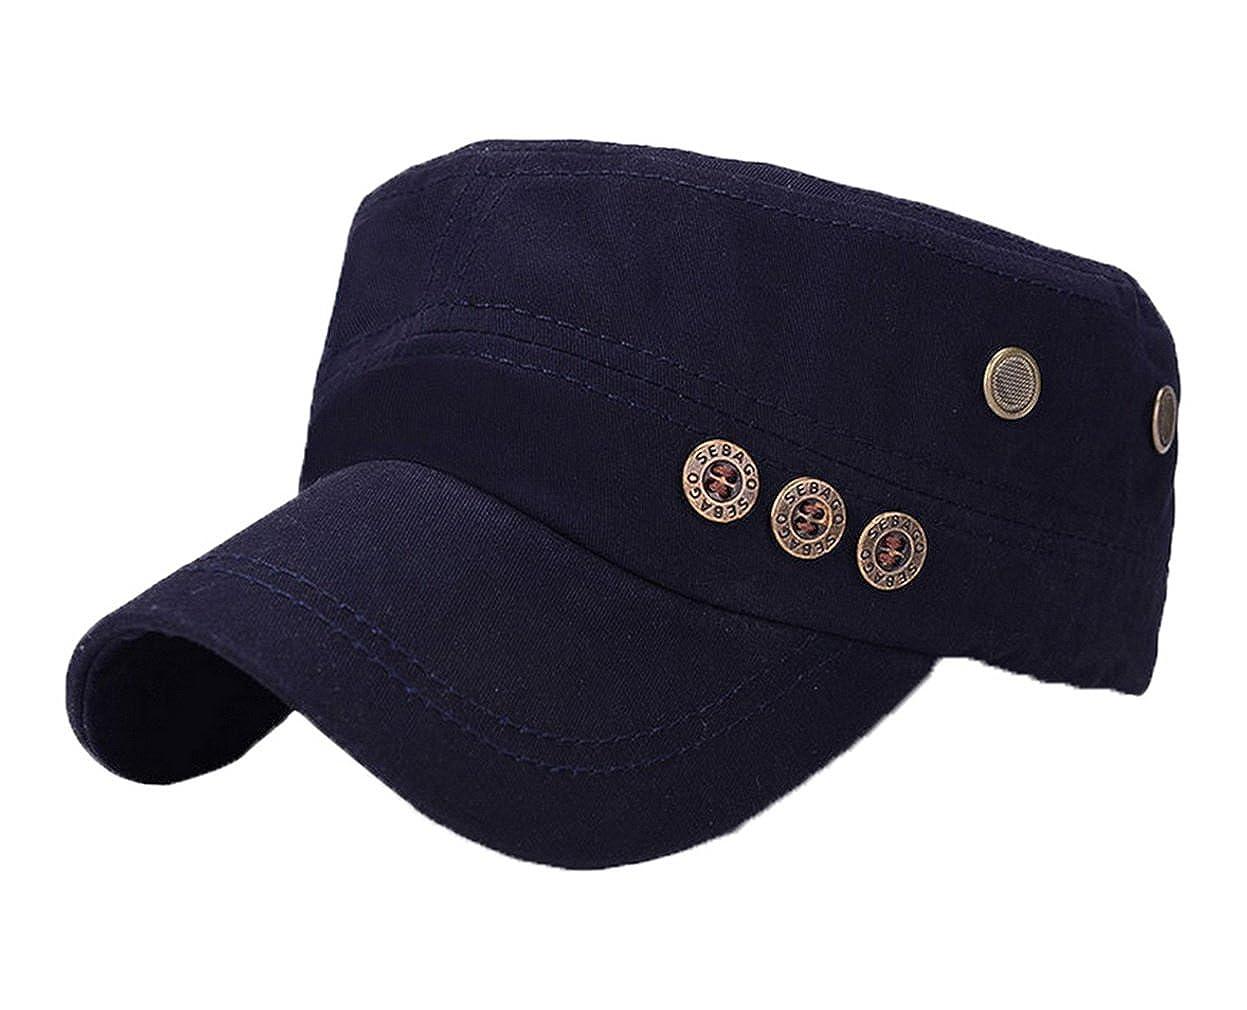 4f37da7dceb Amazon.com  COMVIP Unisex Flat Top Cap Button Plain Adjustable Baseball Cap  Army Green  Clothing